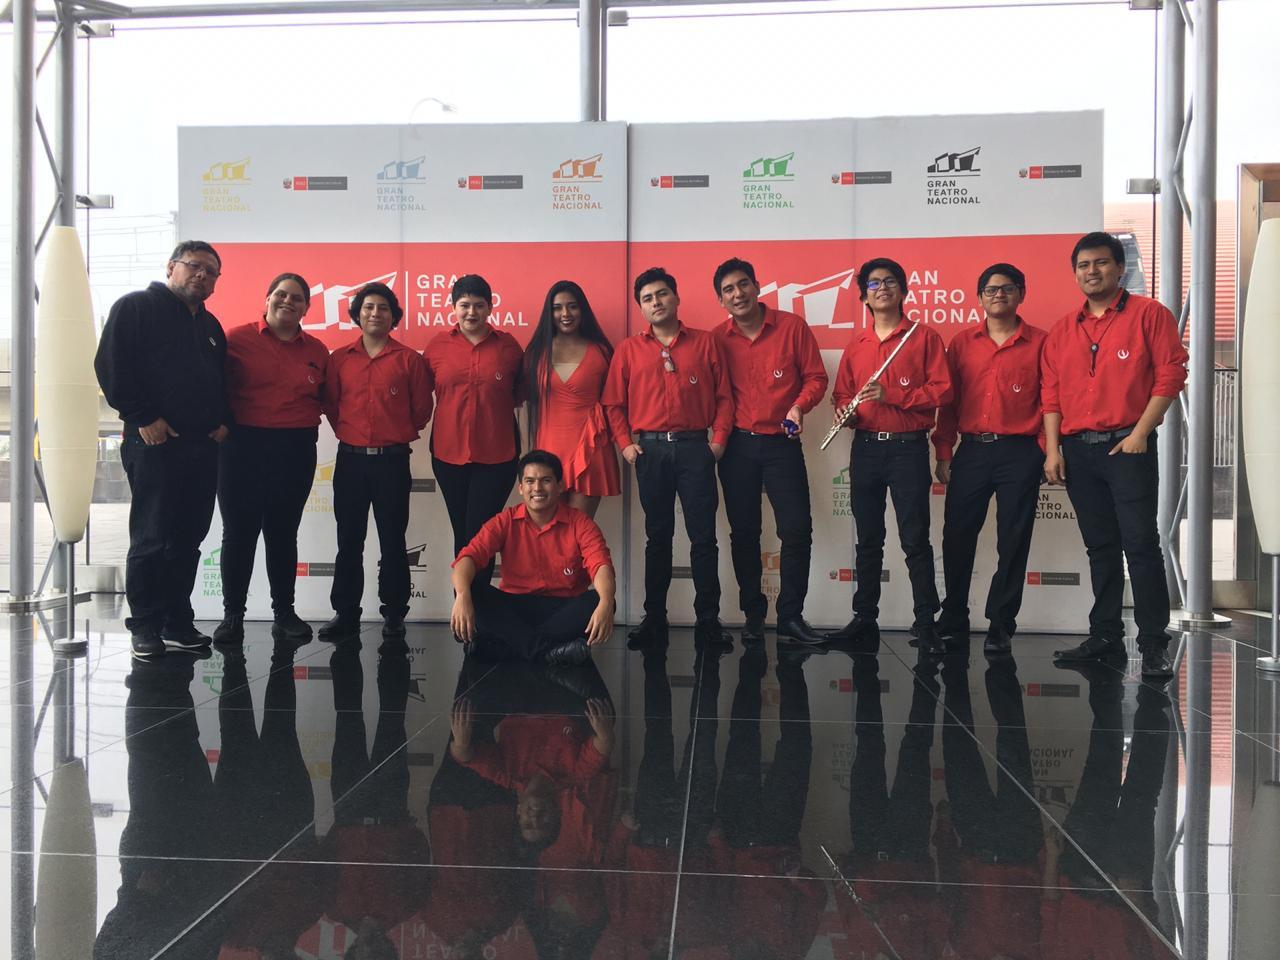 #ElencosUPC: Elenco de Música Peruana culmina exitosa temporada de Conciertos Didácticos